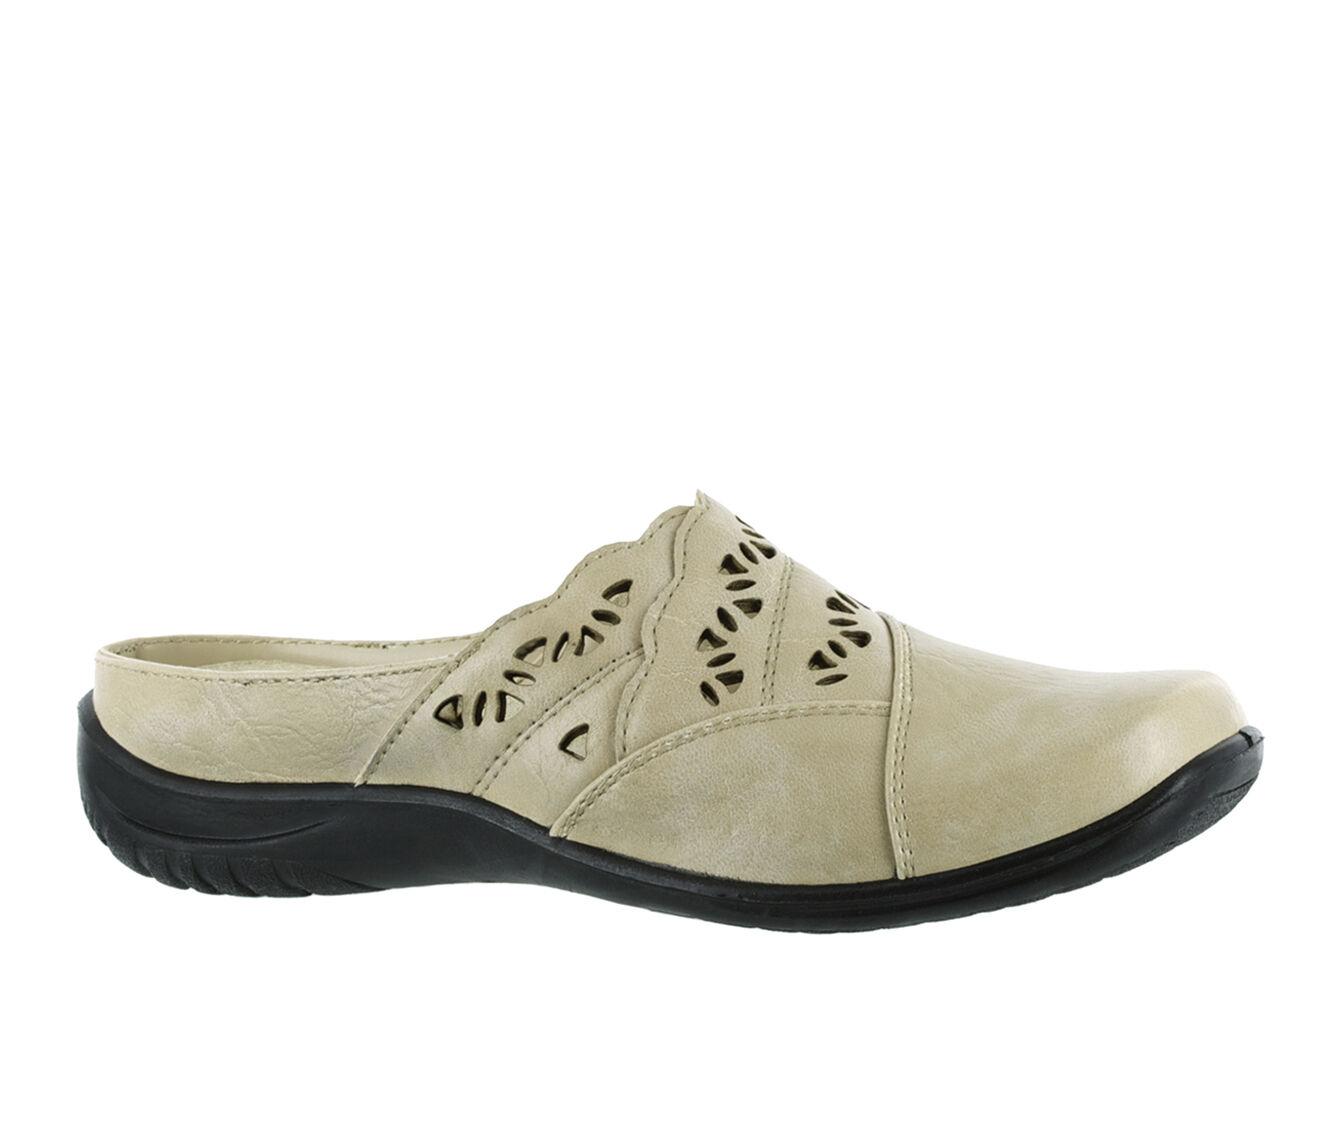 Women's Easy Street Forever Shoes Beige